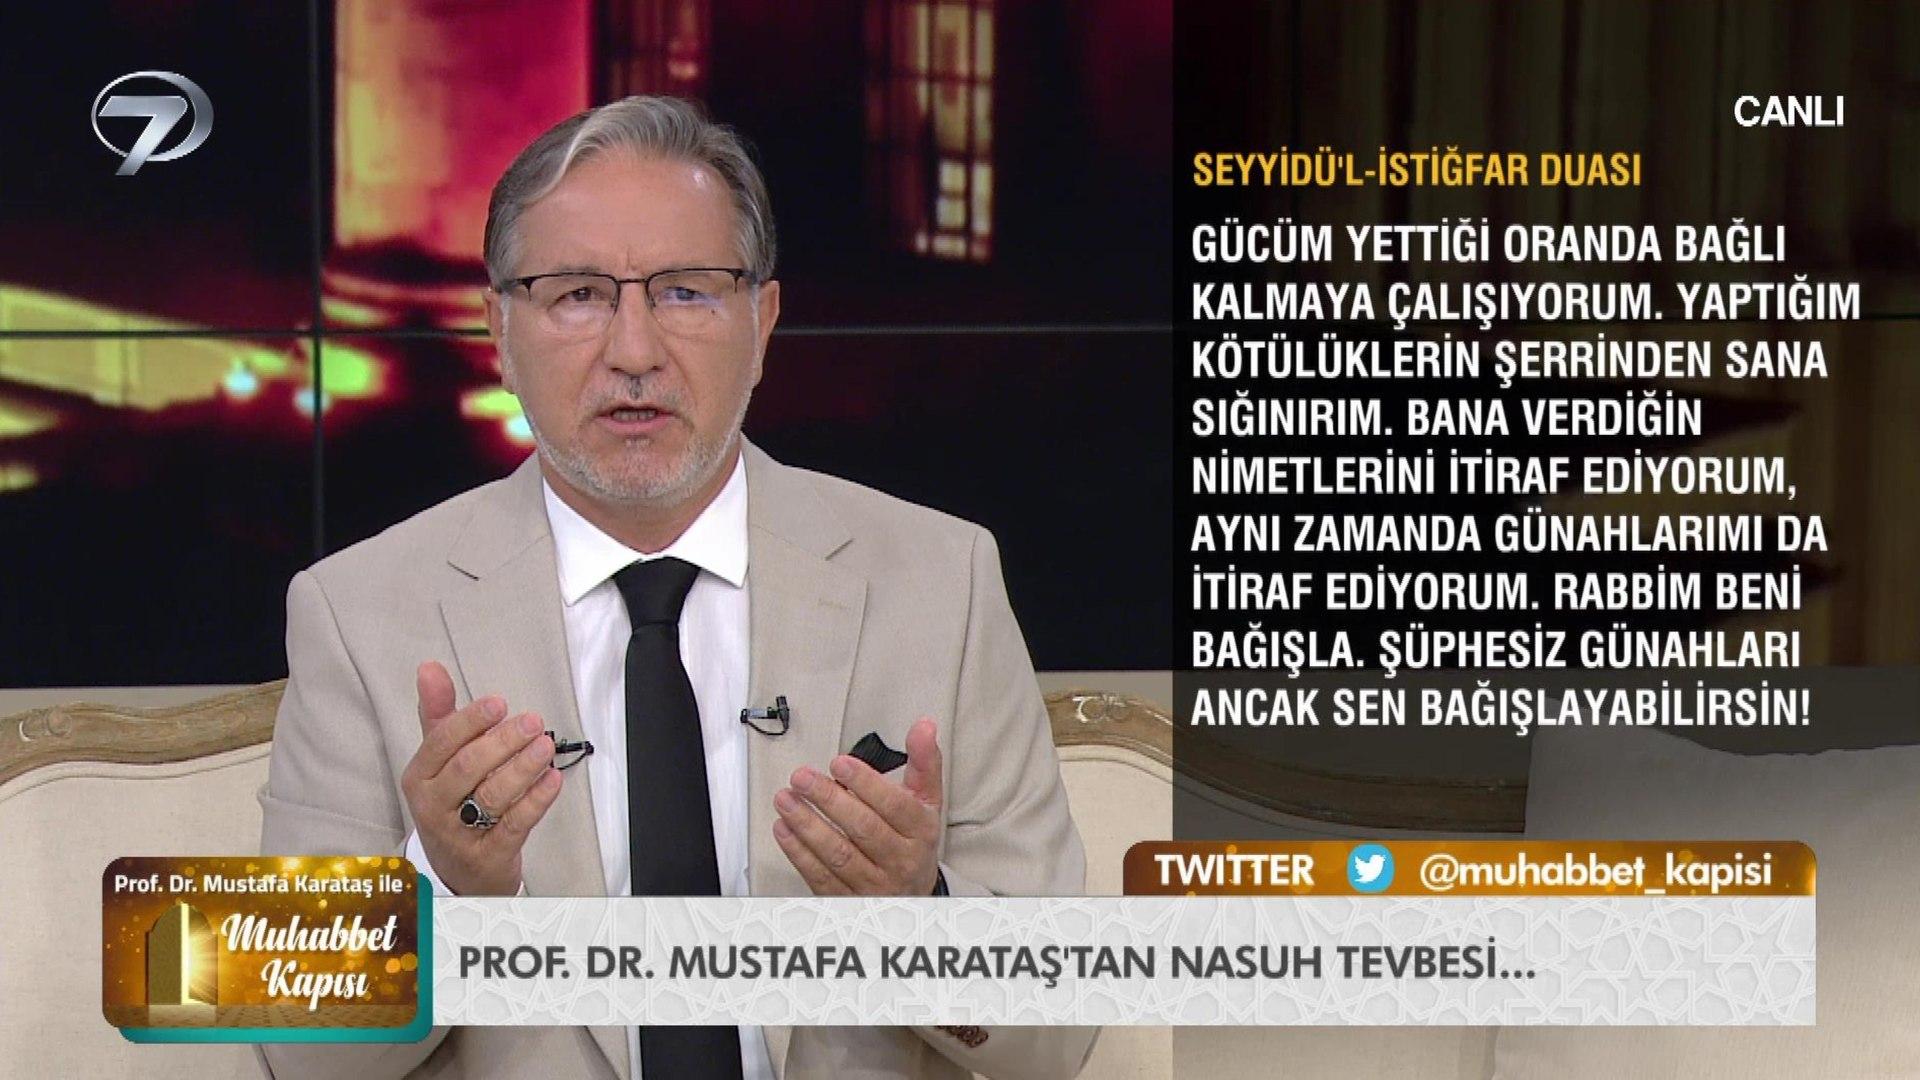 Prof. Dr. Mustafa Karataş ile Muhabbet Kapısı - 1 Ekim 2020 - Dailymotion  Video